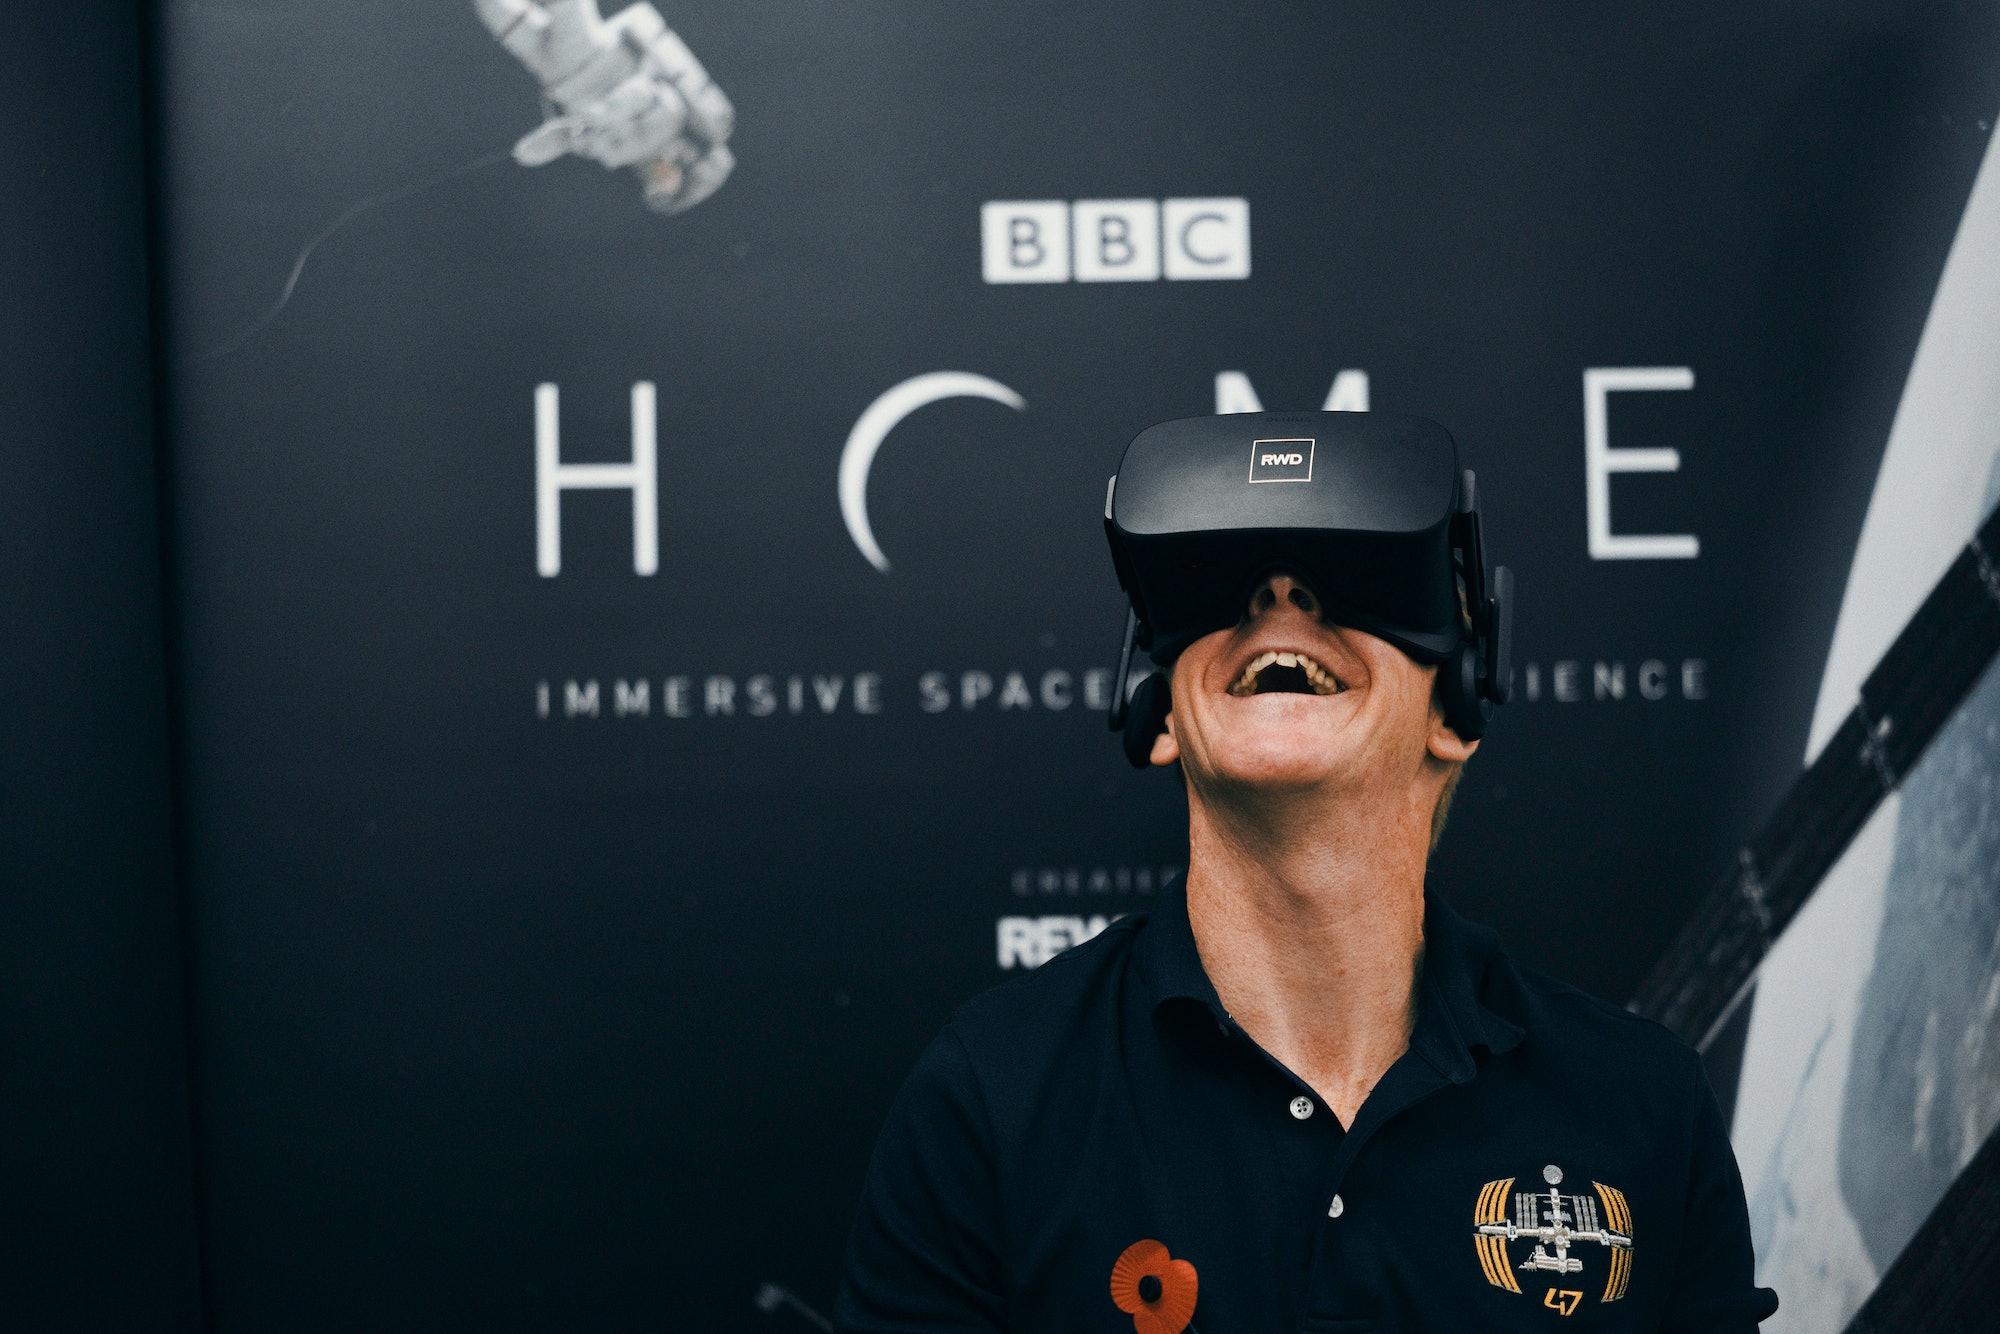 Tim Peake tries the BBC's new spacewalk VR film.